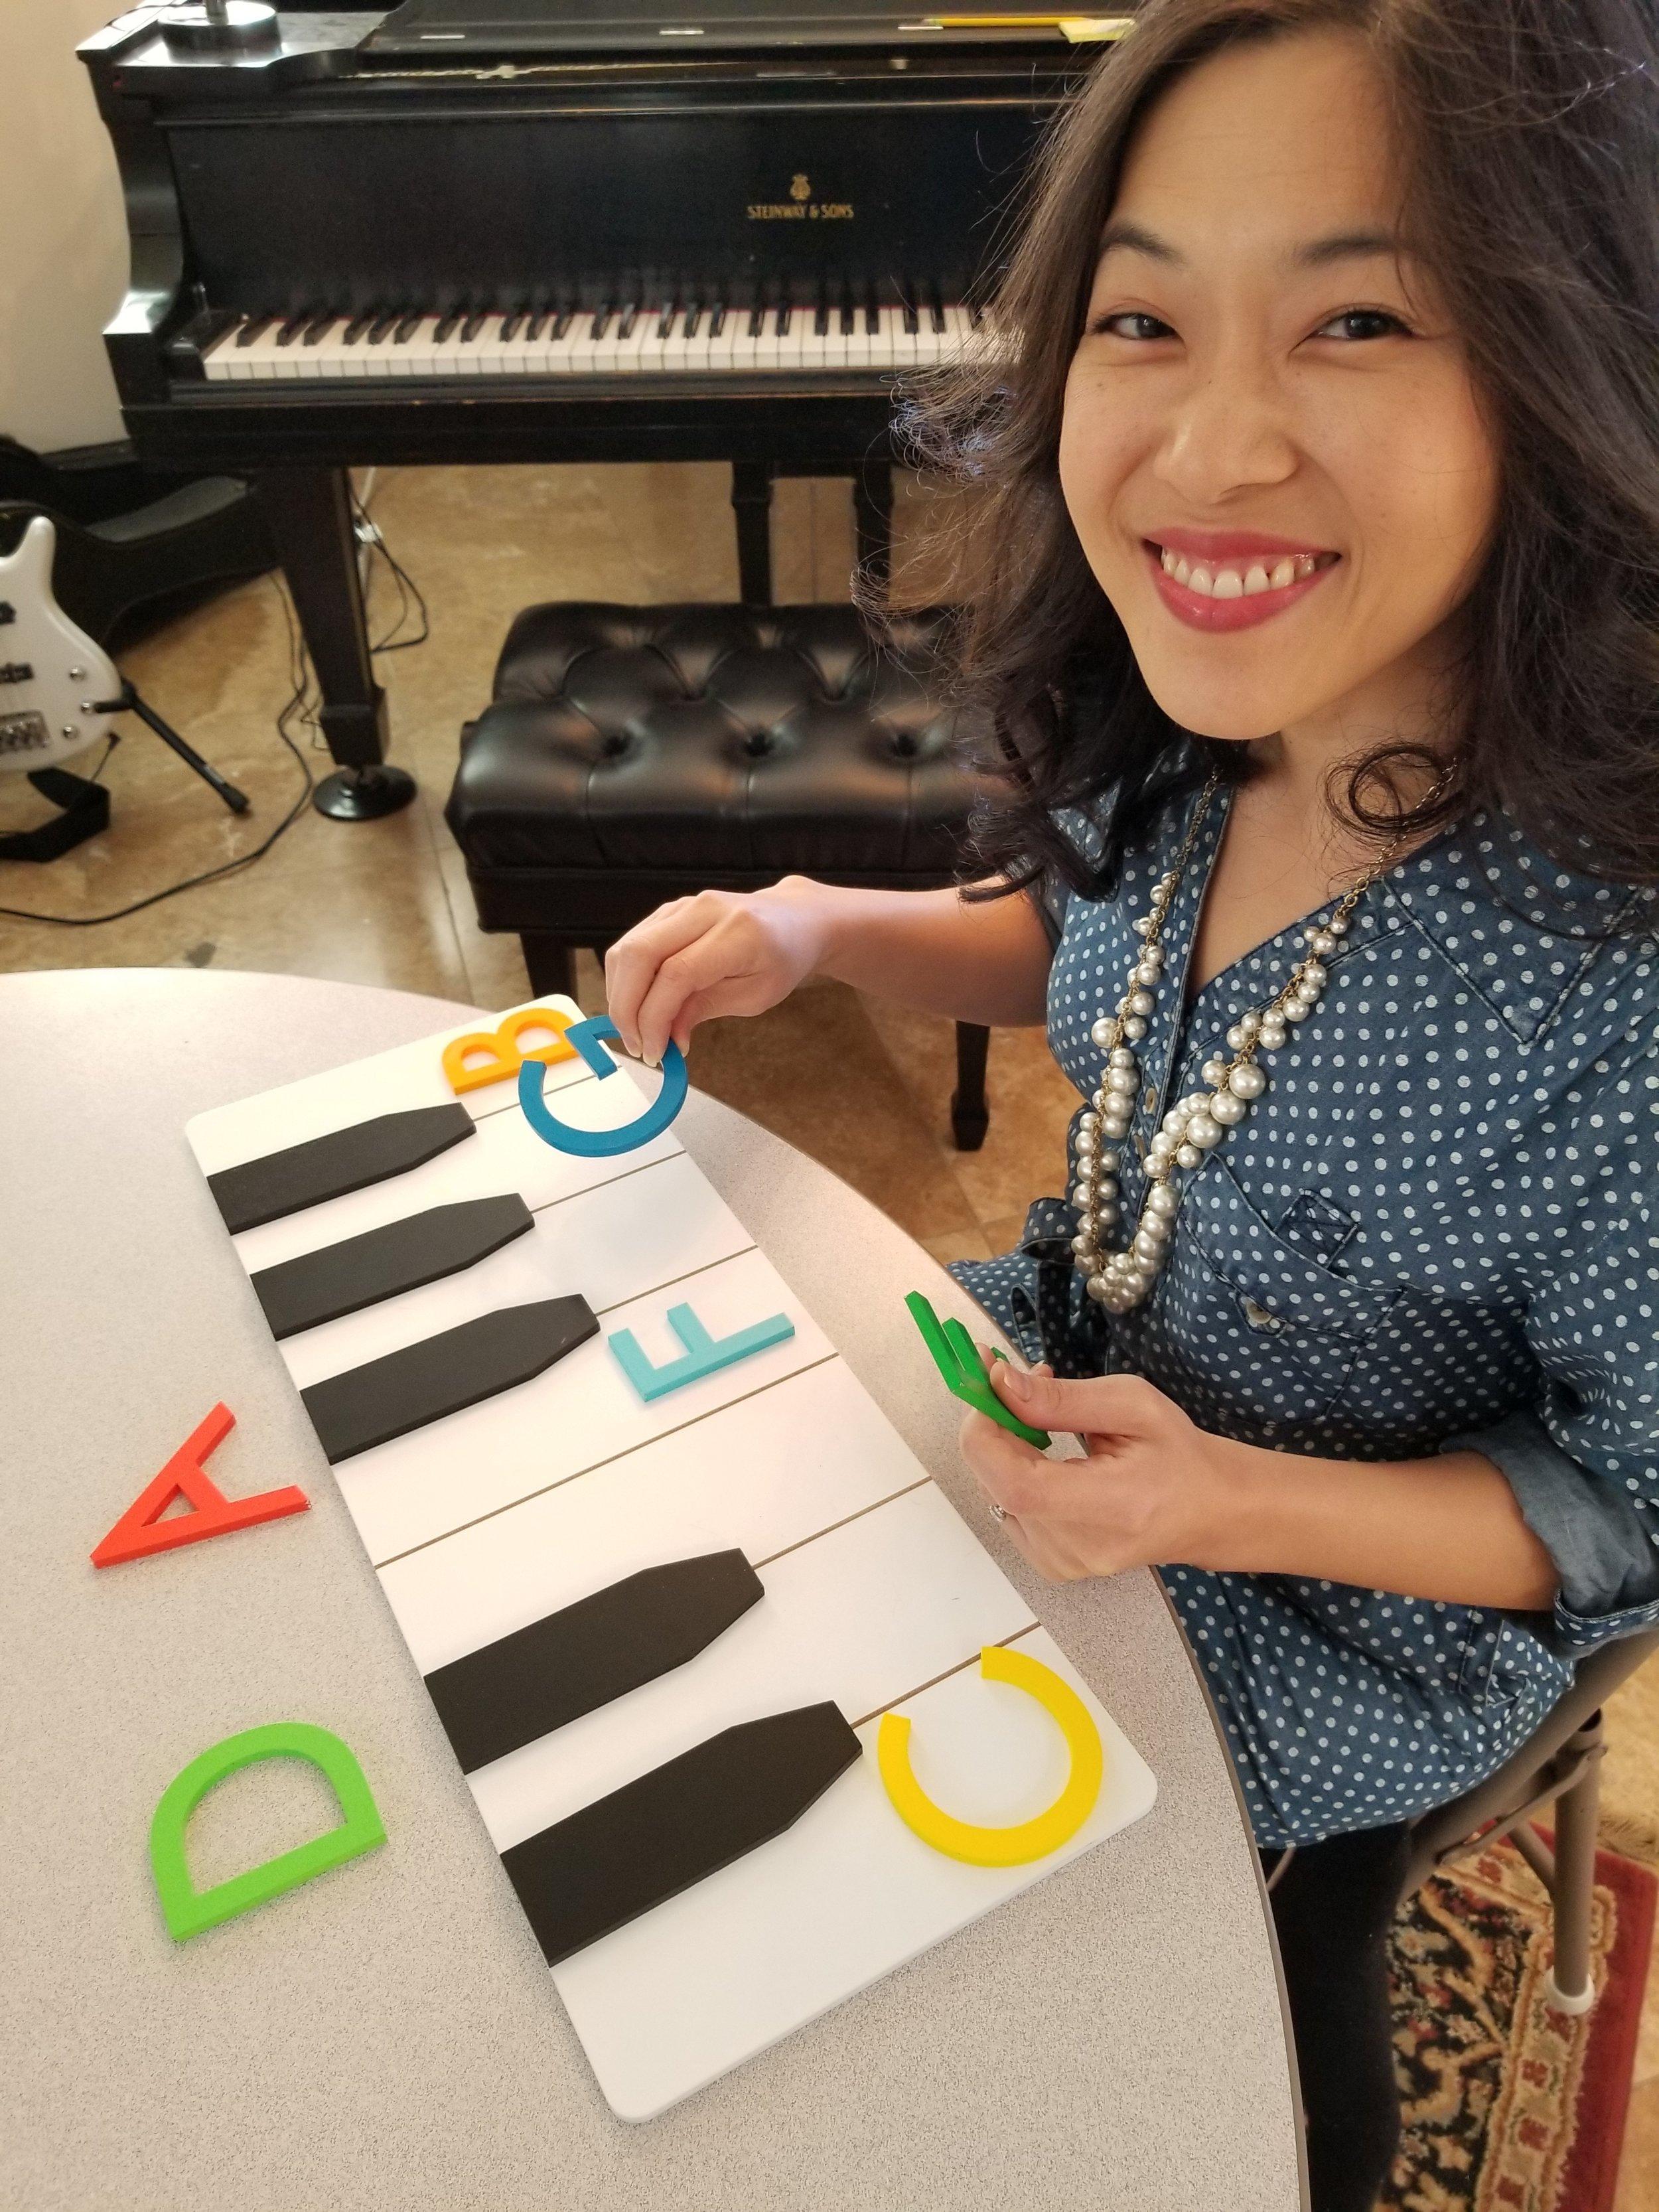 Presto's Piano Keyboard Assistant